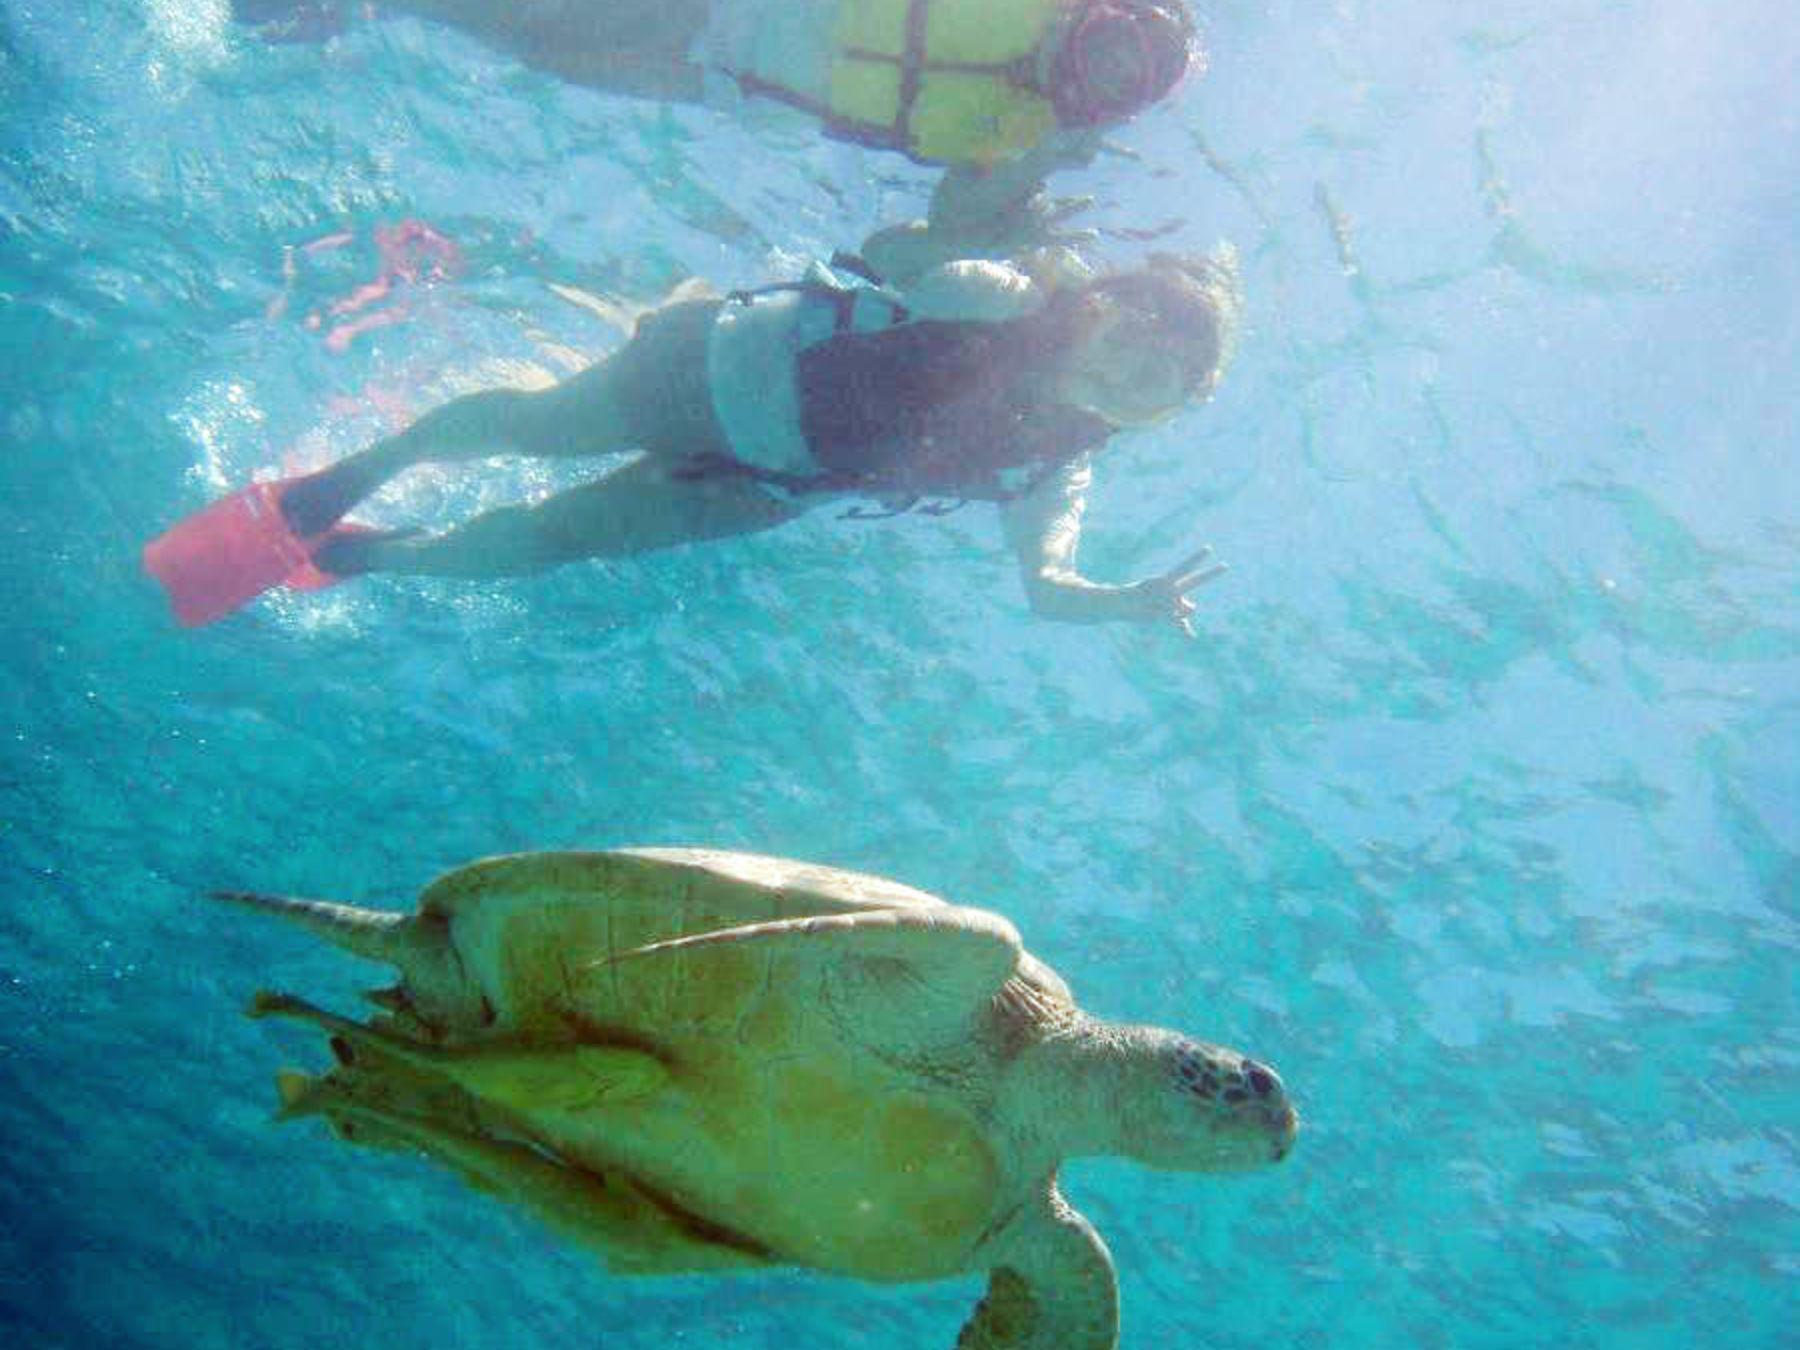 Snorkeling With Sea Turtles in Tokashiki Island's Lagoon - 2